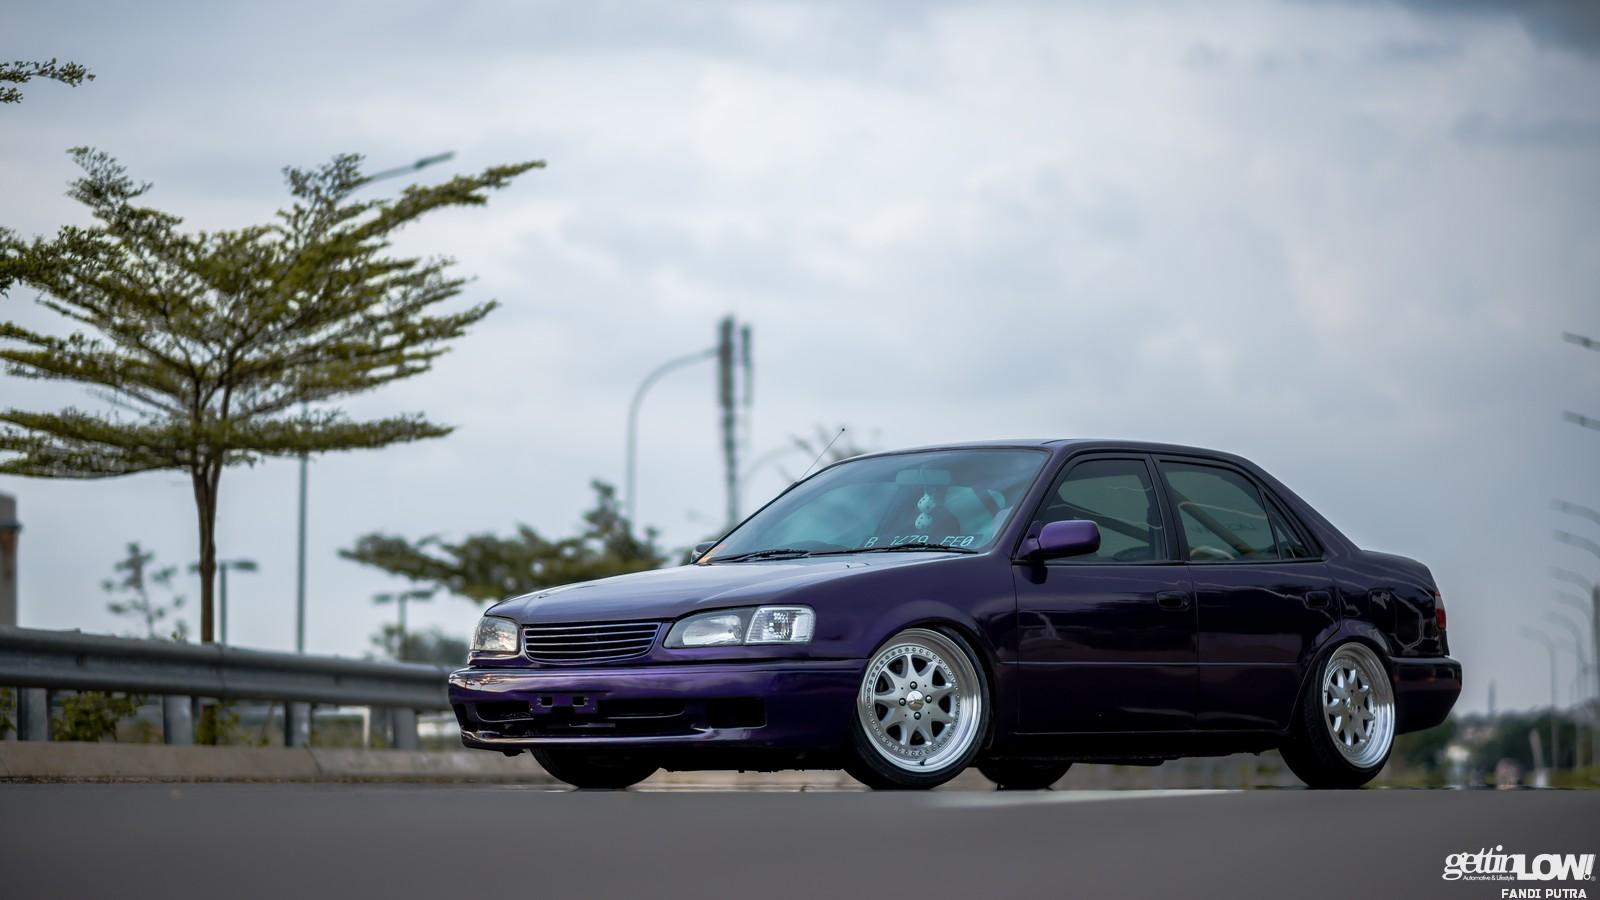 Toyota Corolla LACS